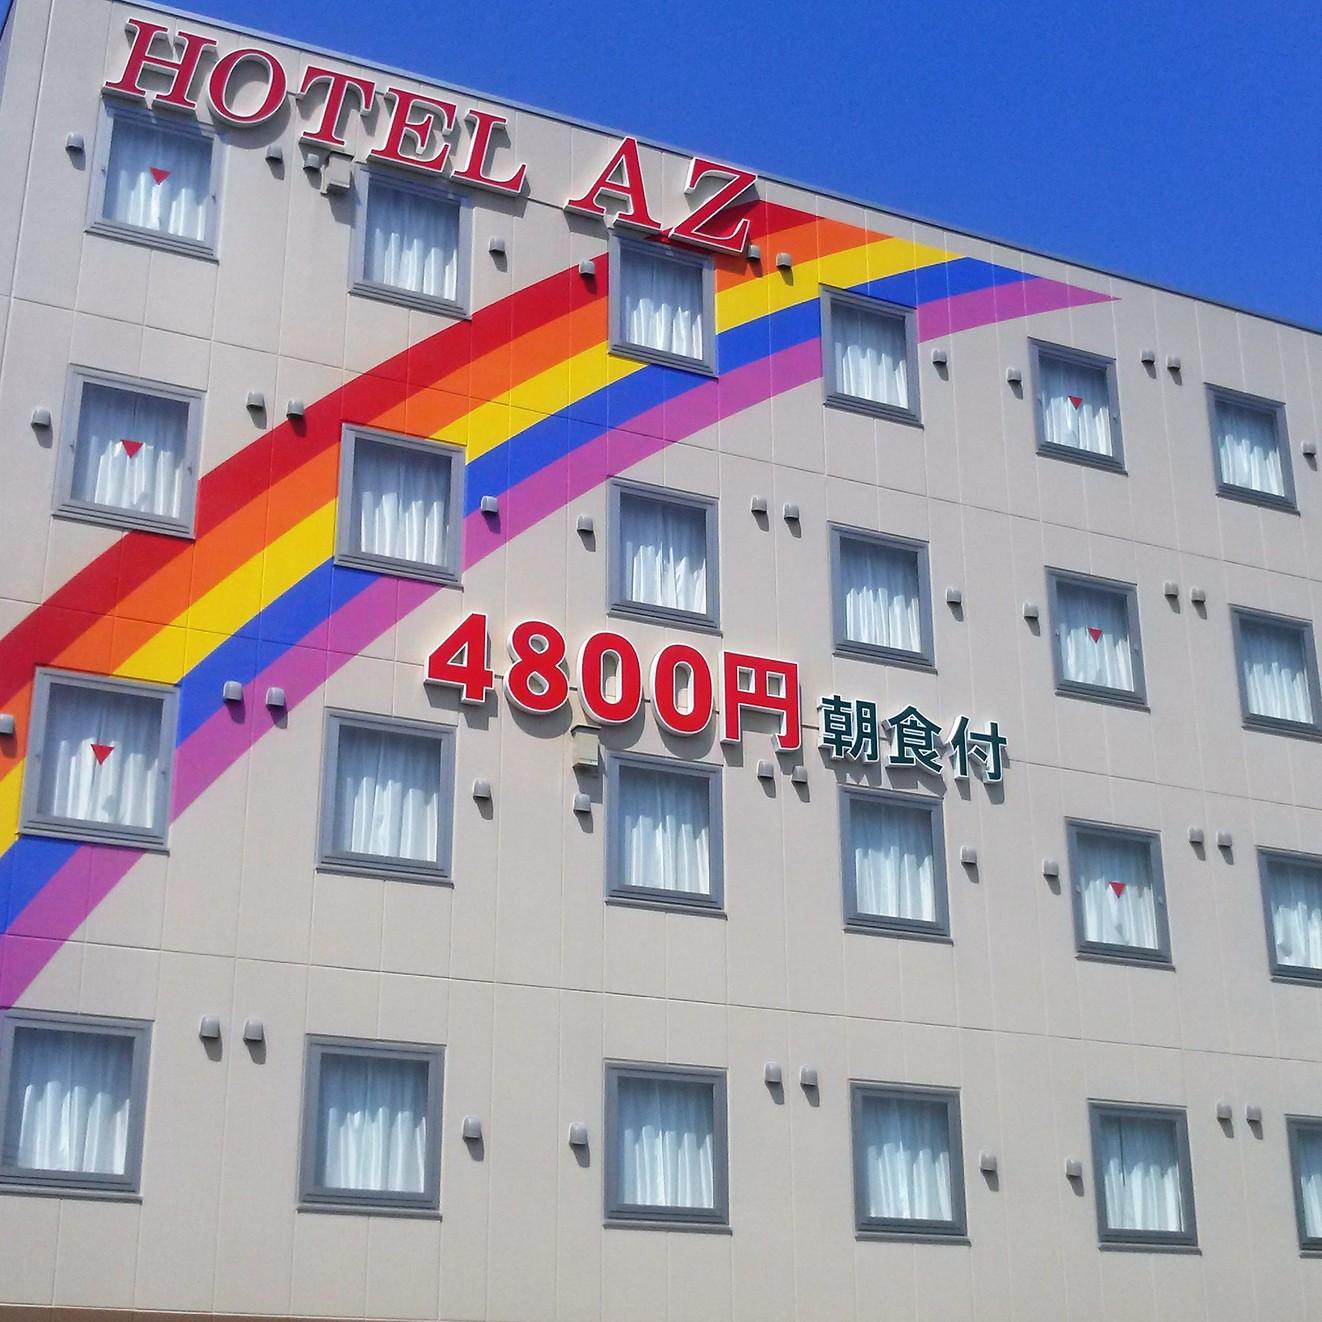 HOTEL AZ 大分別府駅前店...